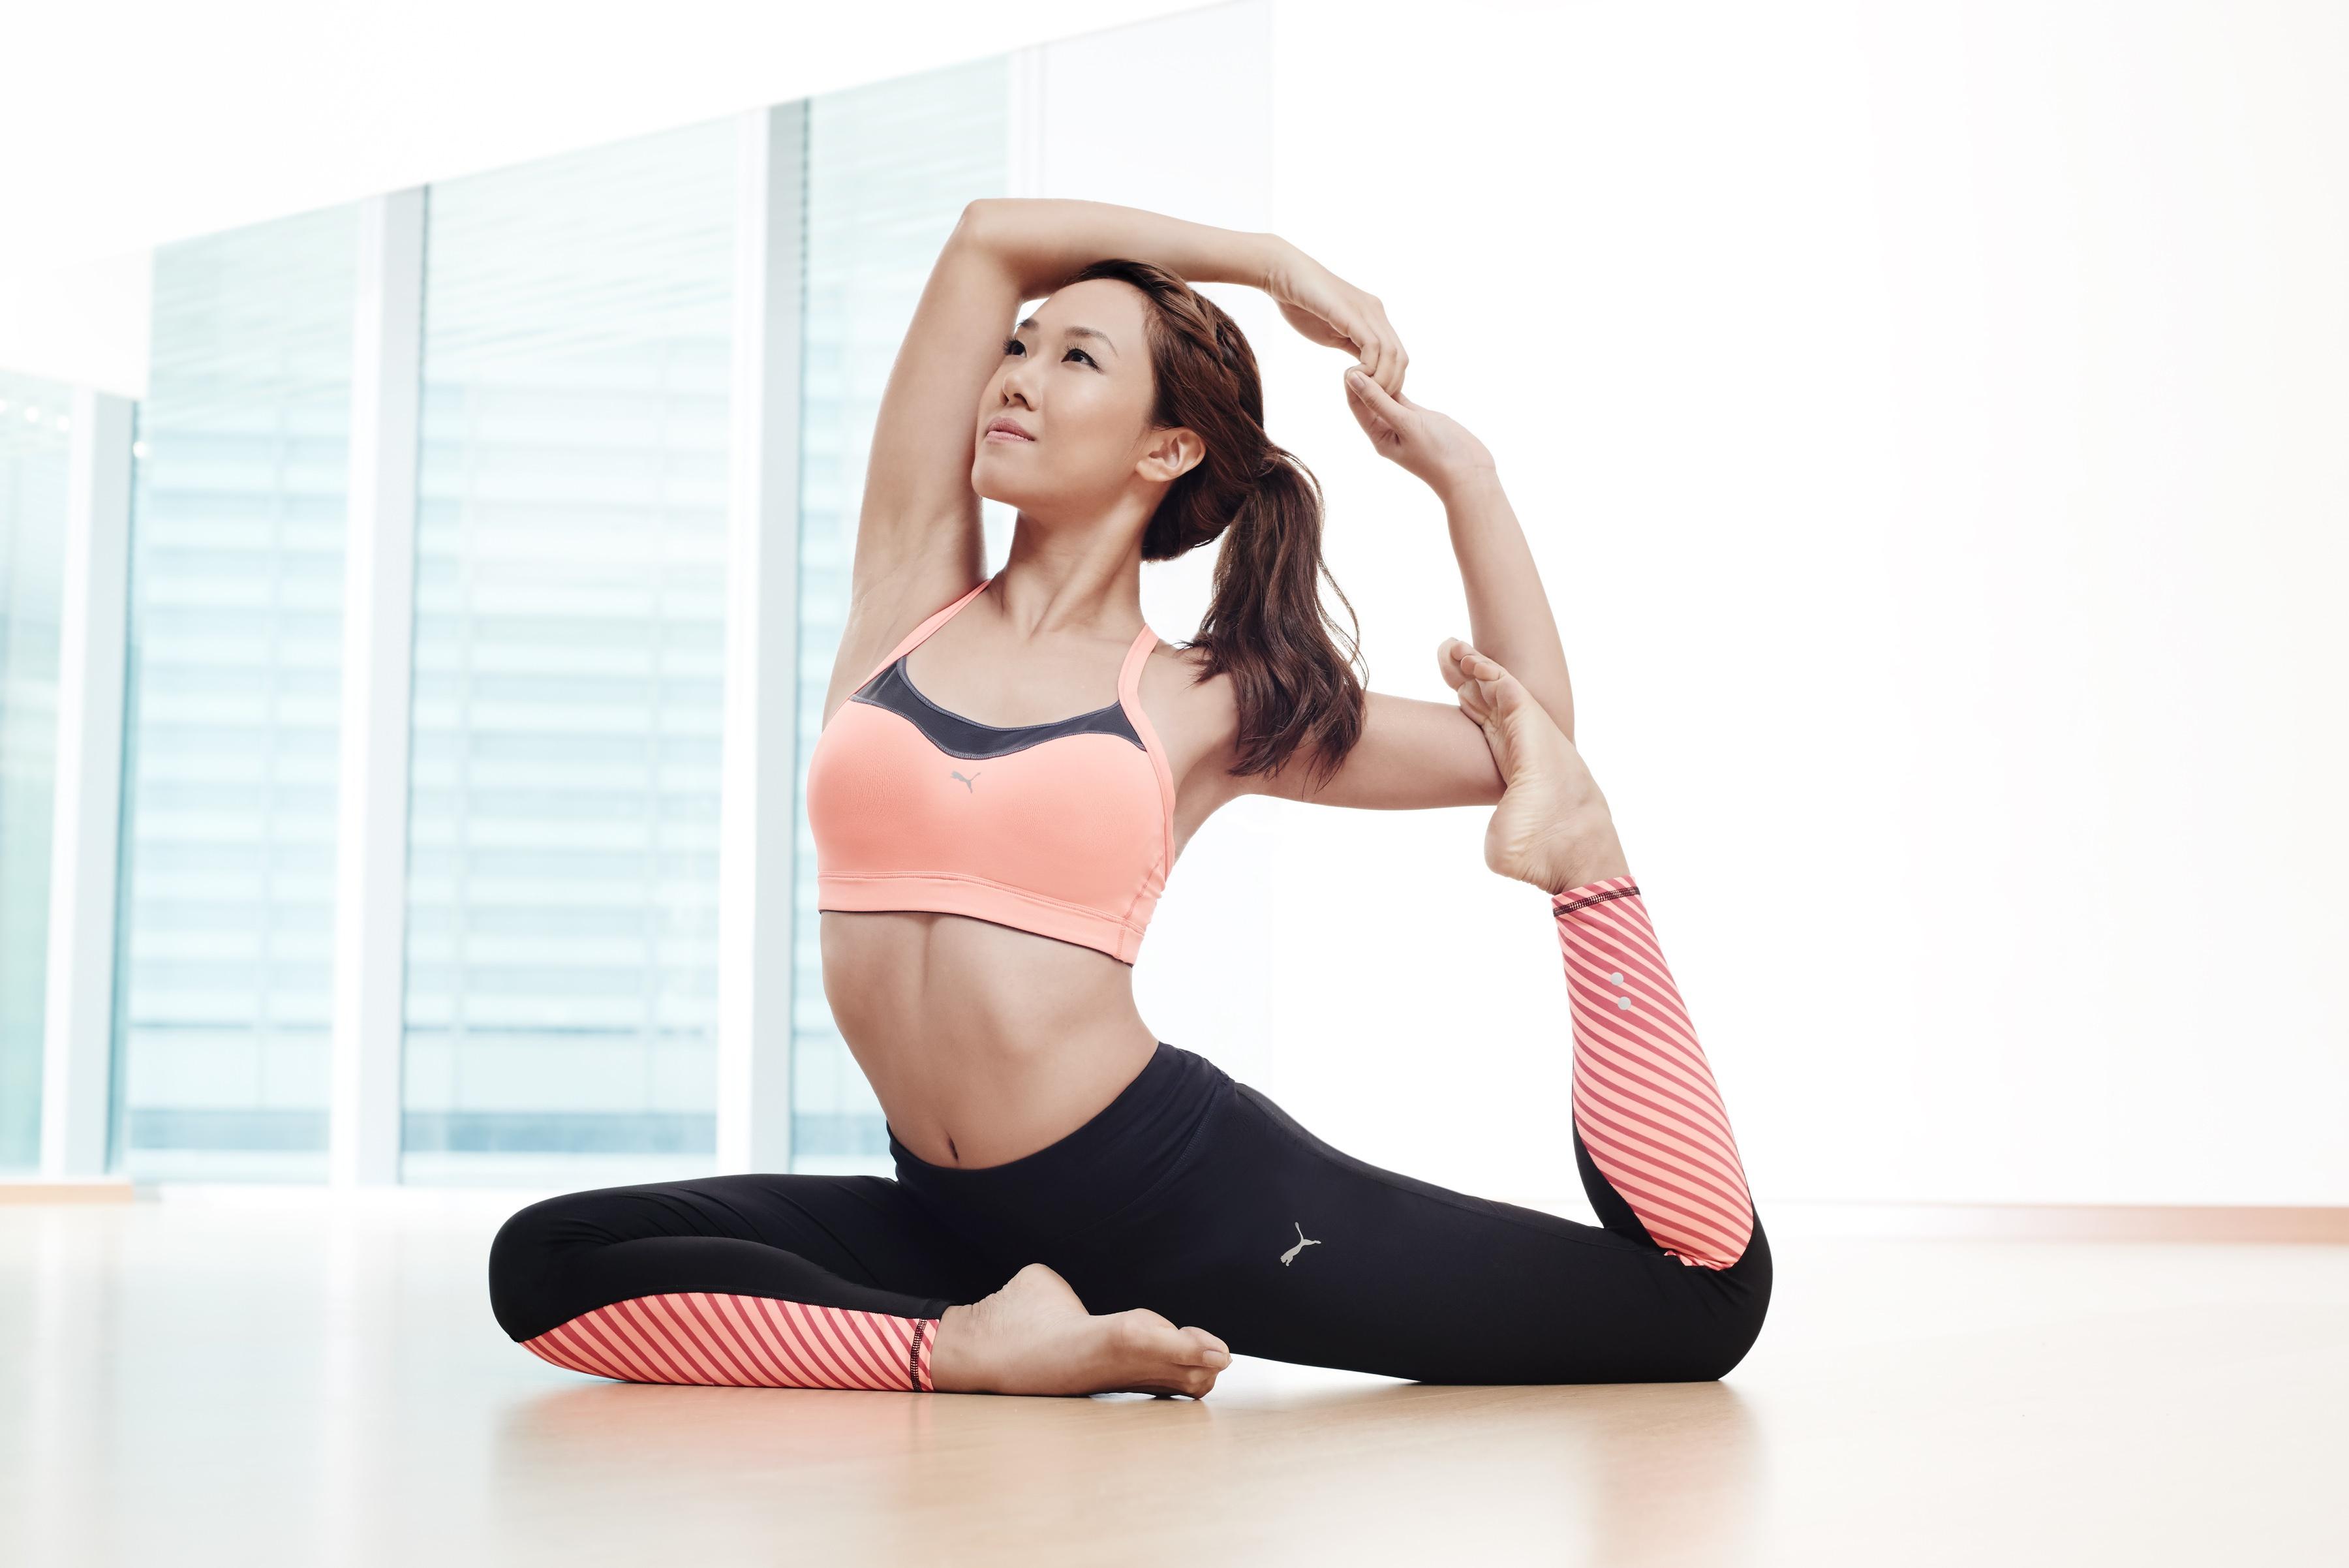 фото йога и спорт нас своя производственная